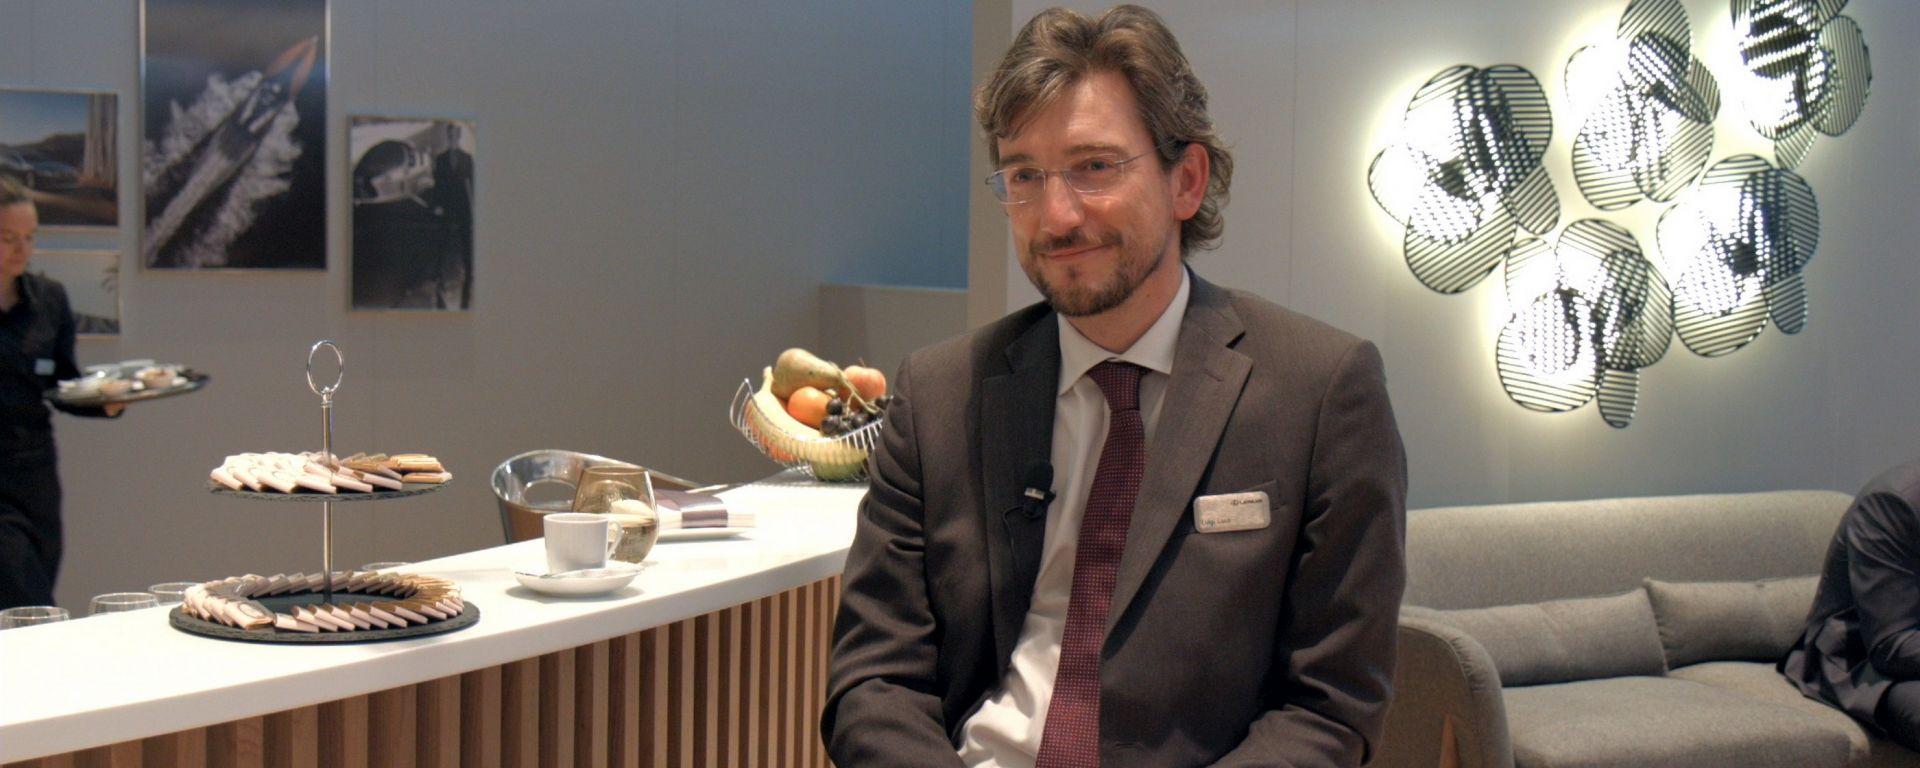 Lexus LS 500h, intervista dal salone di Ginevra 2017, Luigi Lucà, direttore Lexus Division